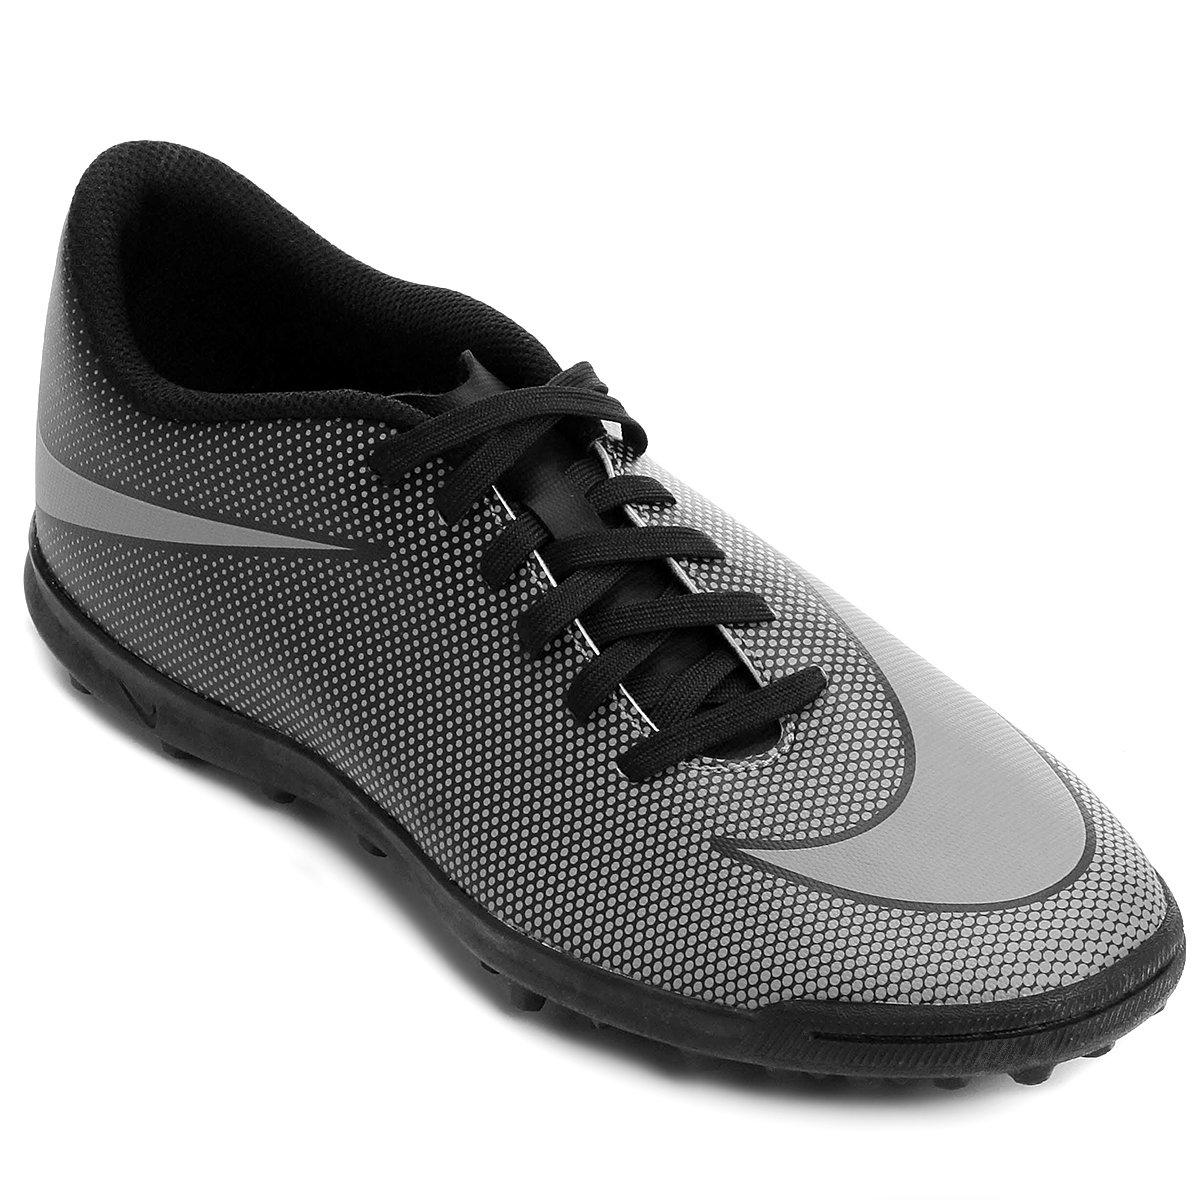 Chuteira Society Nike Bravata 2 TF - Preto e Cinza - Compre Agora ... 926ba9db2332d